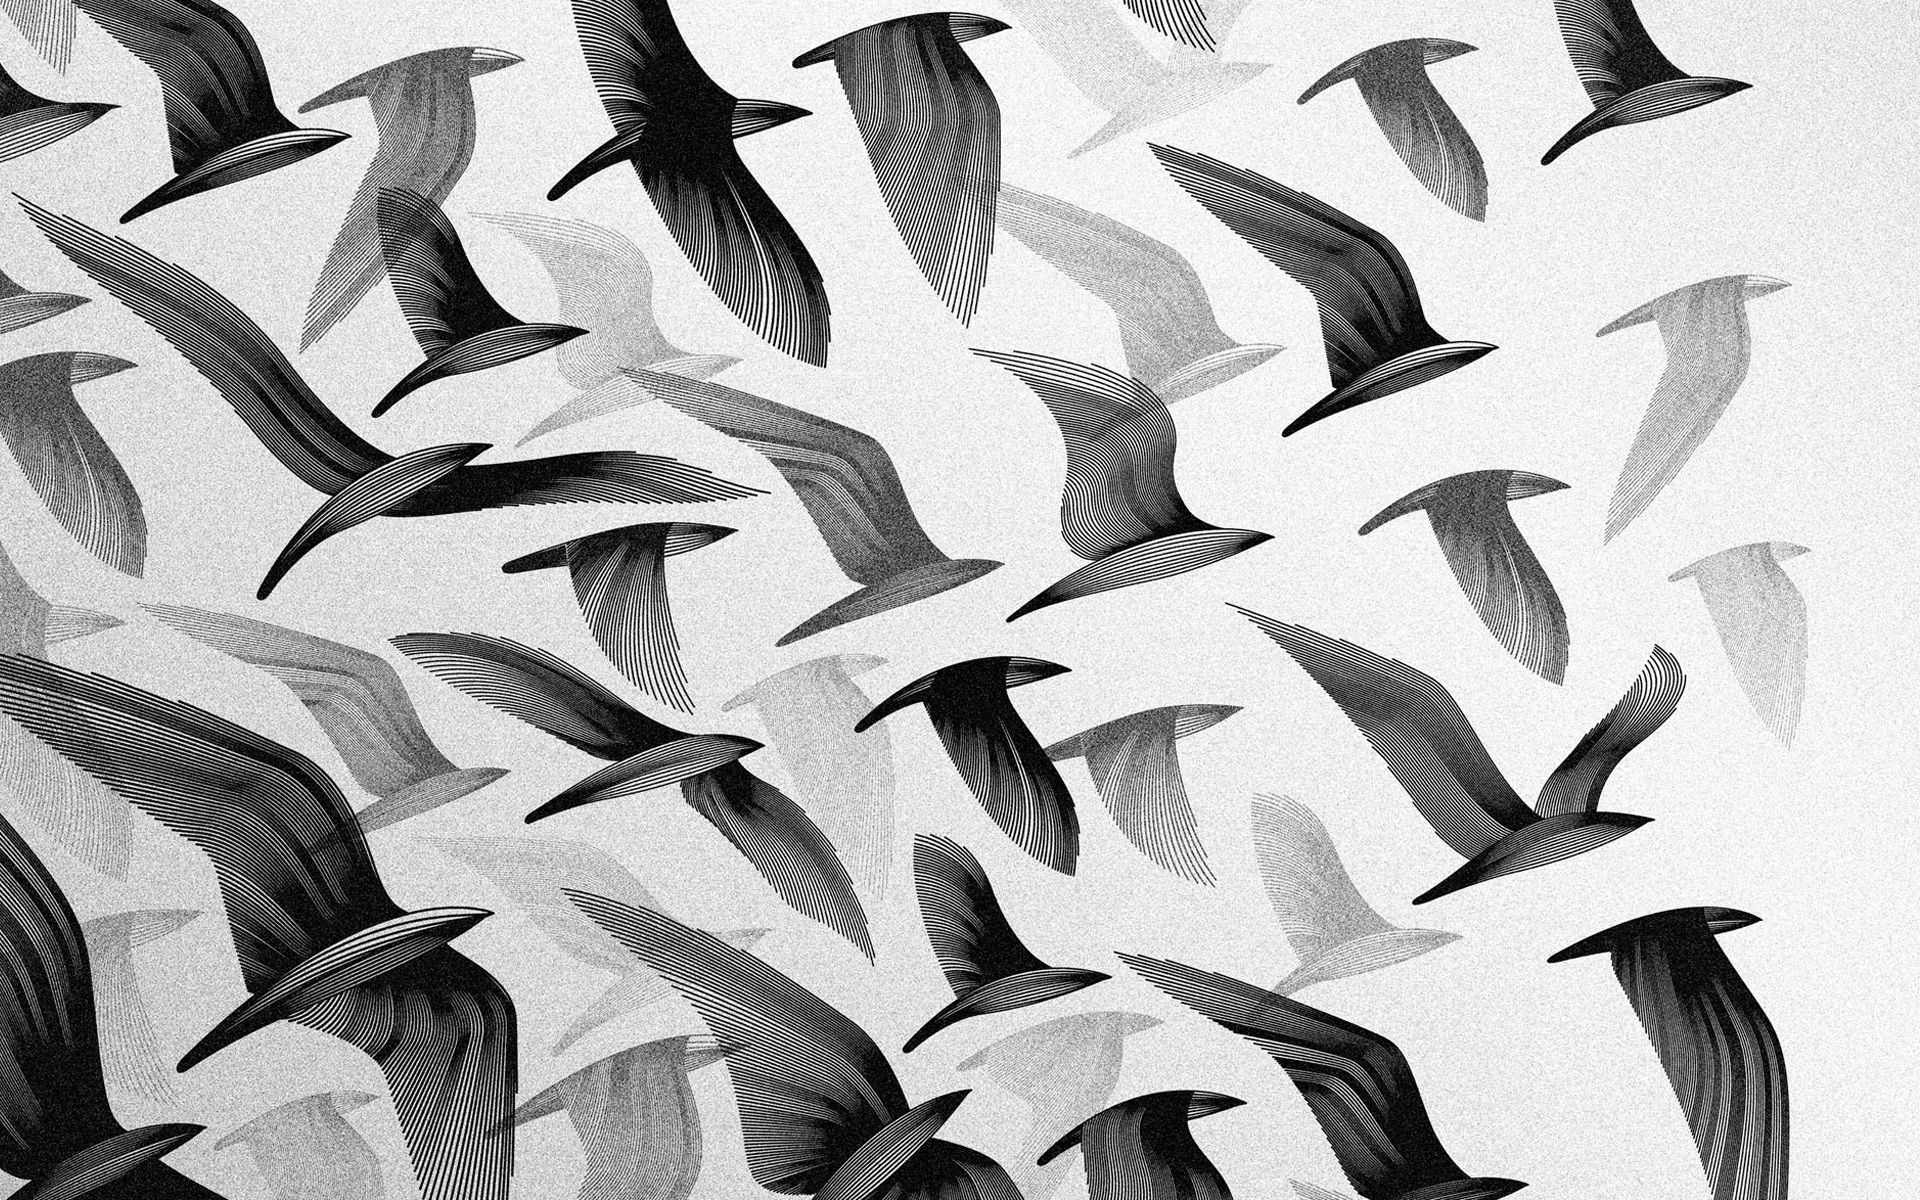 Tumblr Black And White Desktop Wallpapers Top Free Tumblr Black